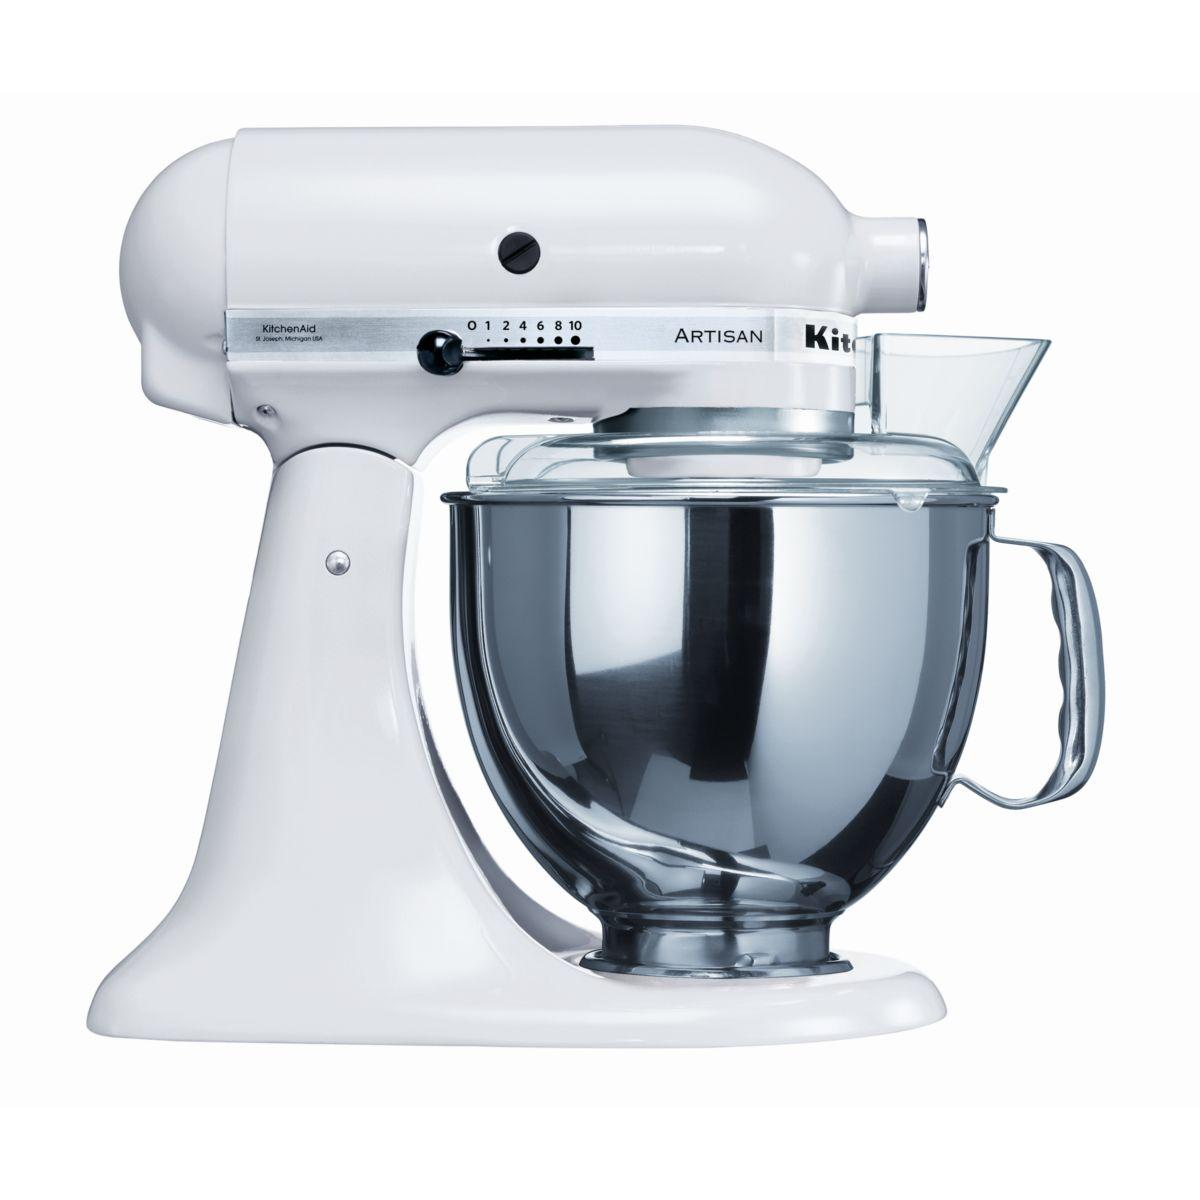 Robot sur socle Artisan® KitchenAid 5KSM150PS EWH Blanc